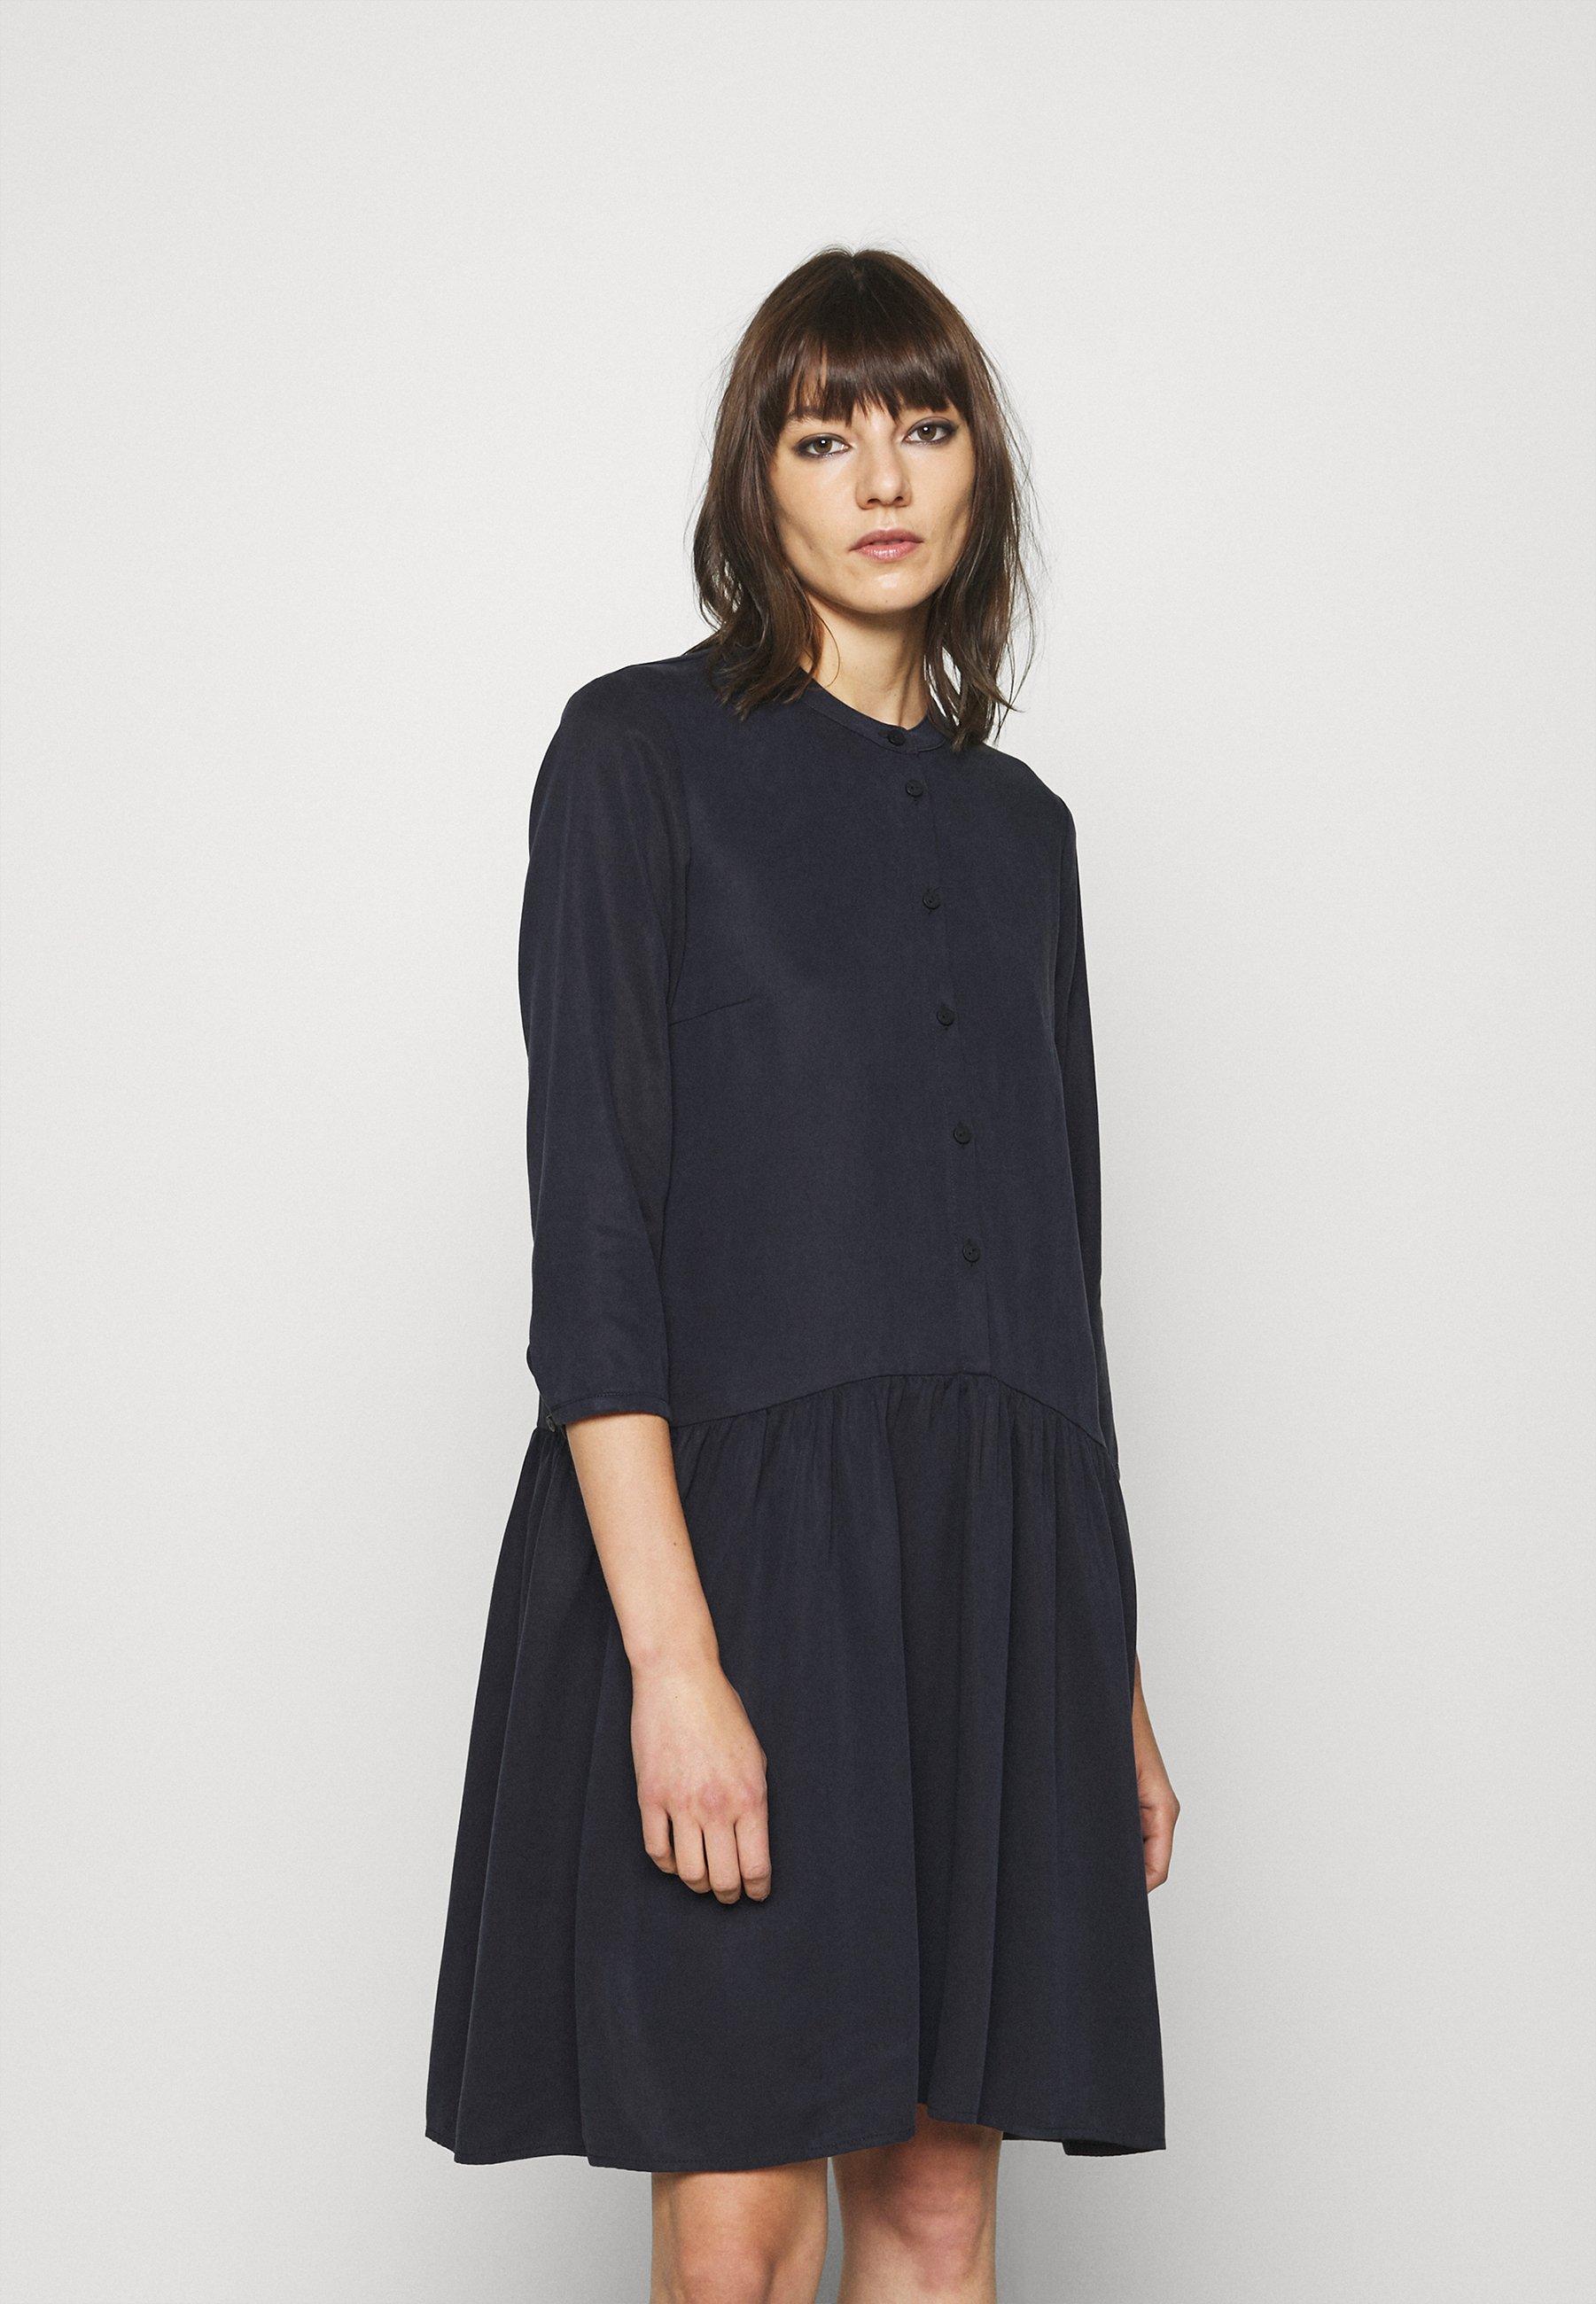 Donna DRESS SHORT SLEEVE - Abito a camicia